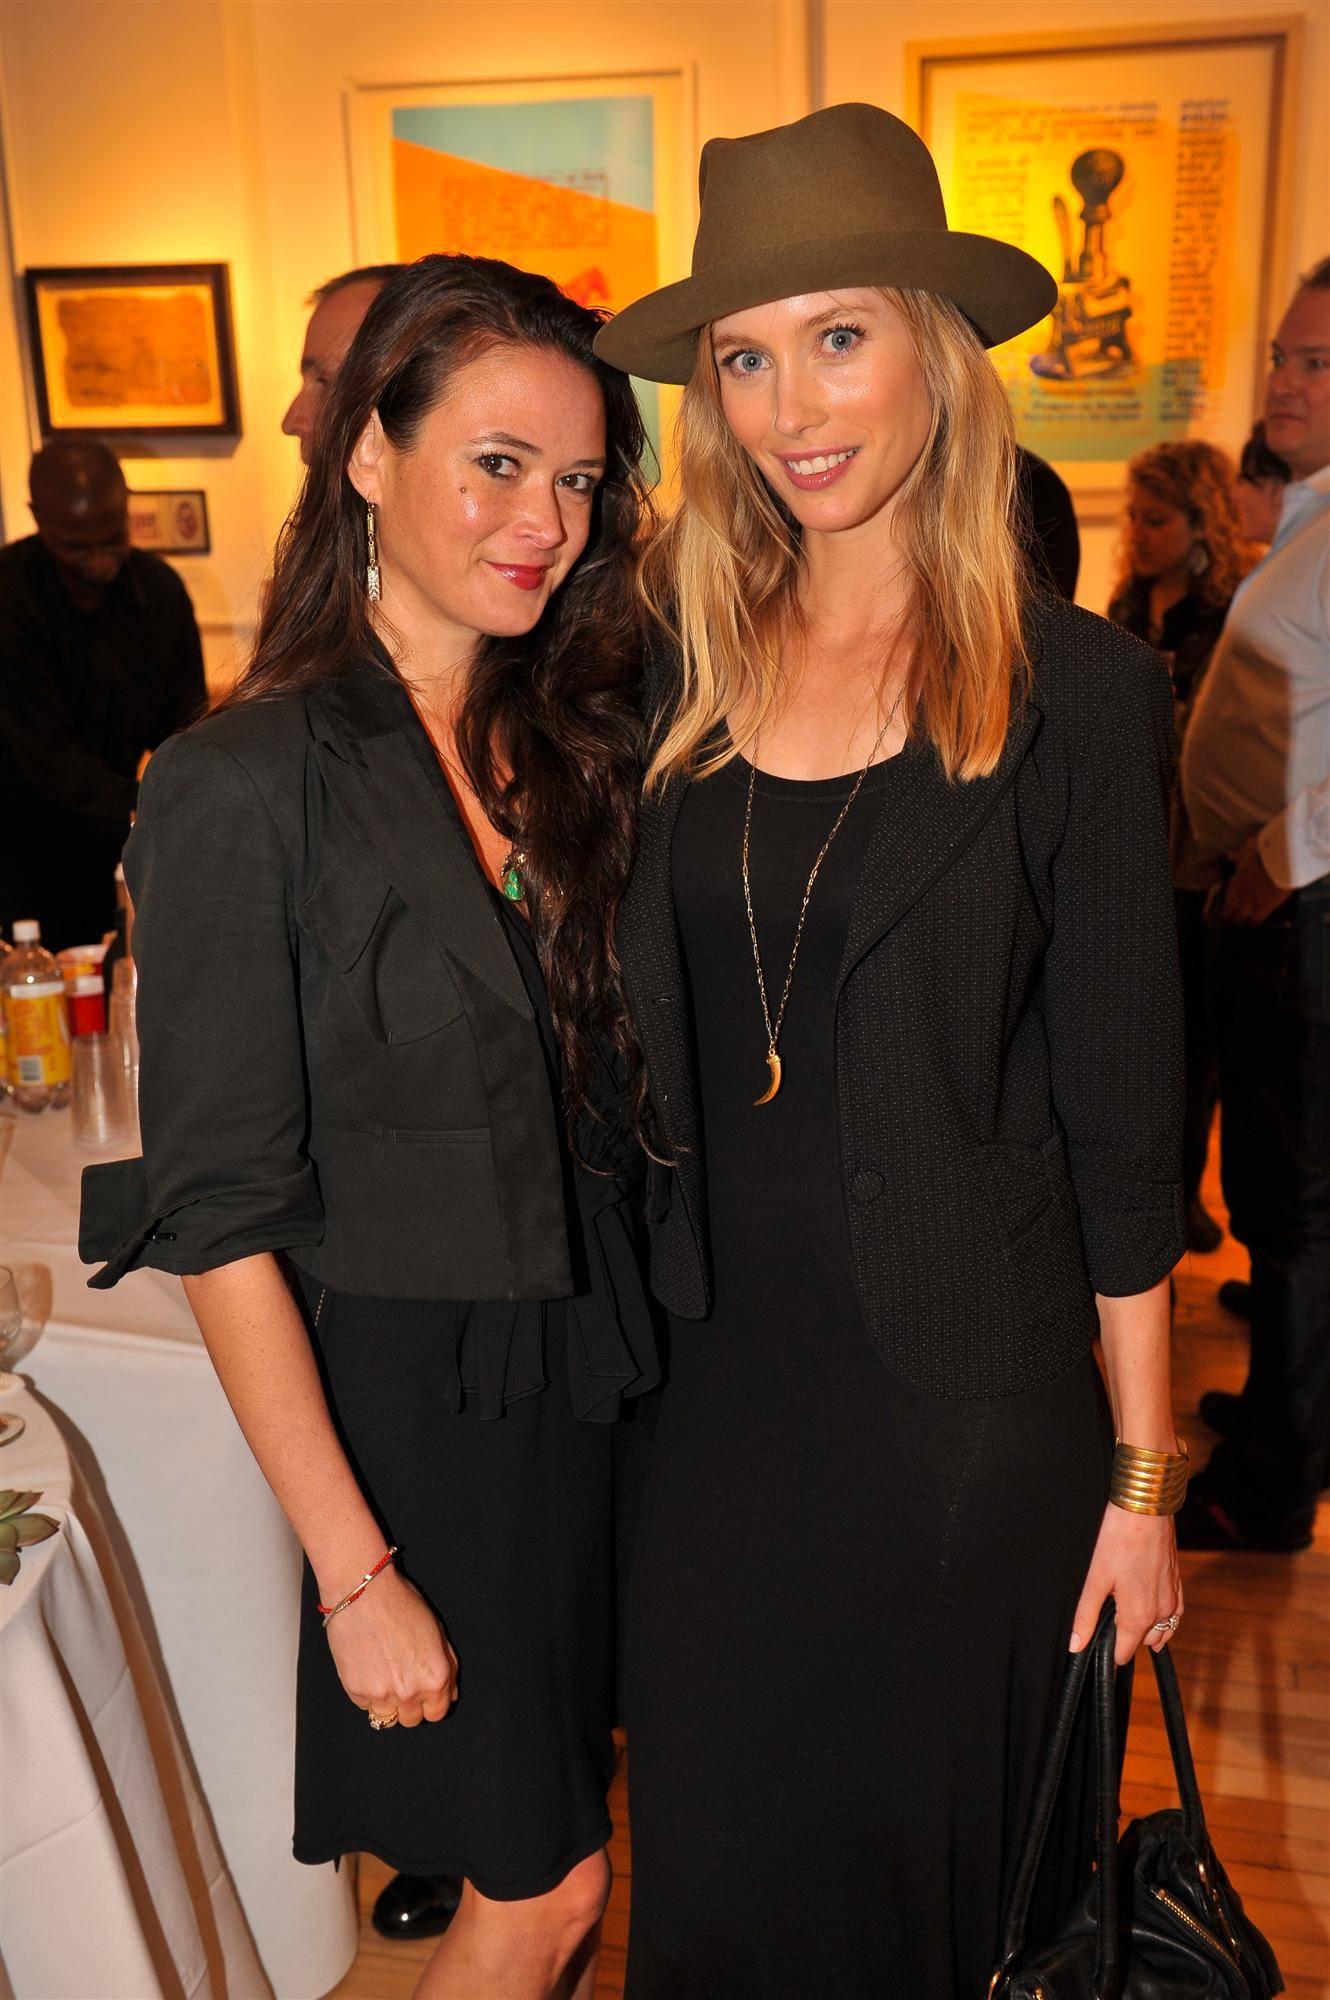 Christine Pressman & Camilla Thorsson (Custom)